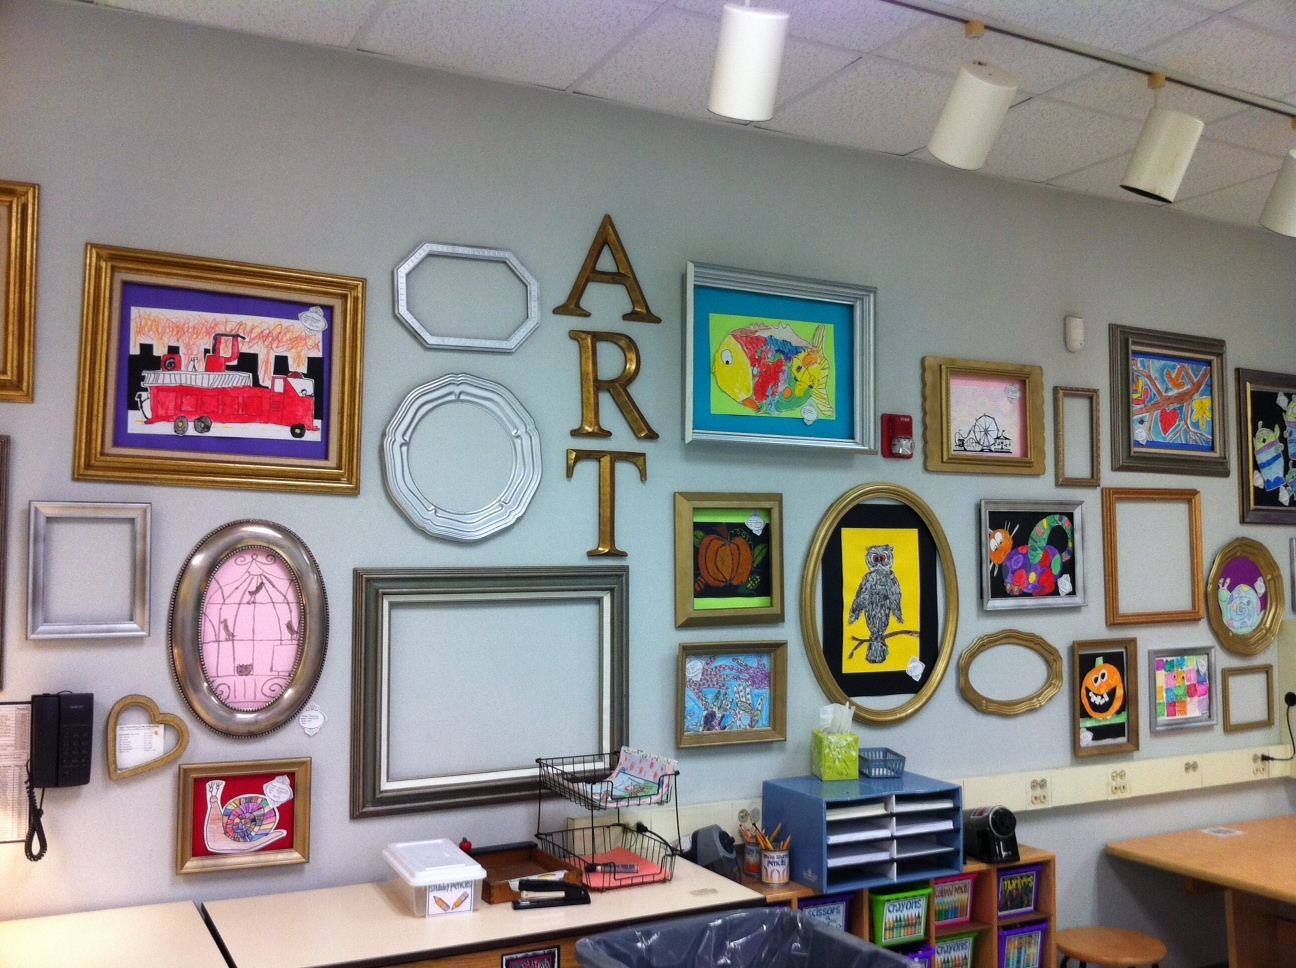 Apex Elementary Art Wall Of Frames For Student Artwork